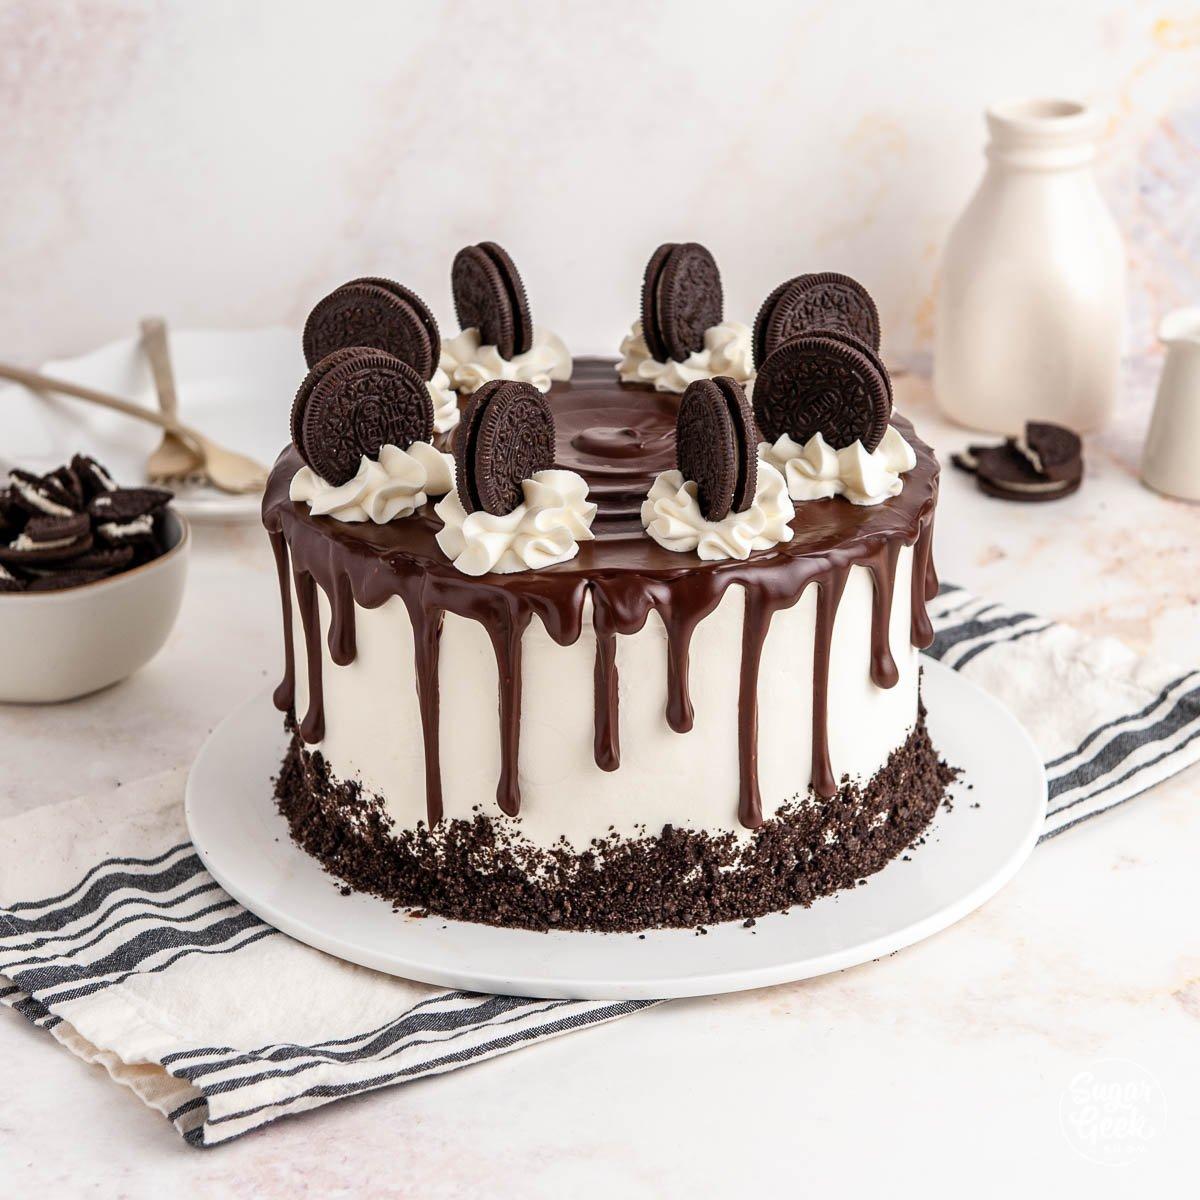 oreo ice cream cake on a white background